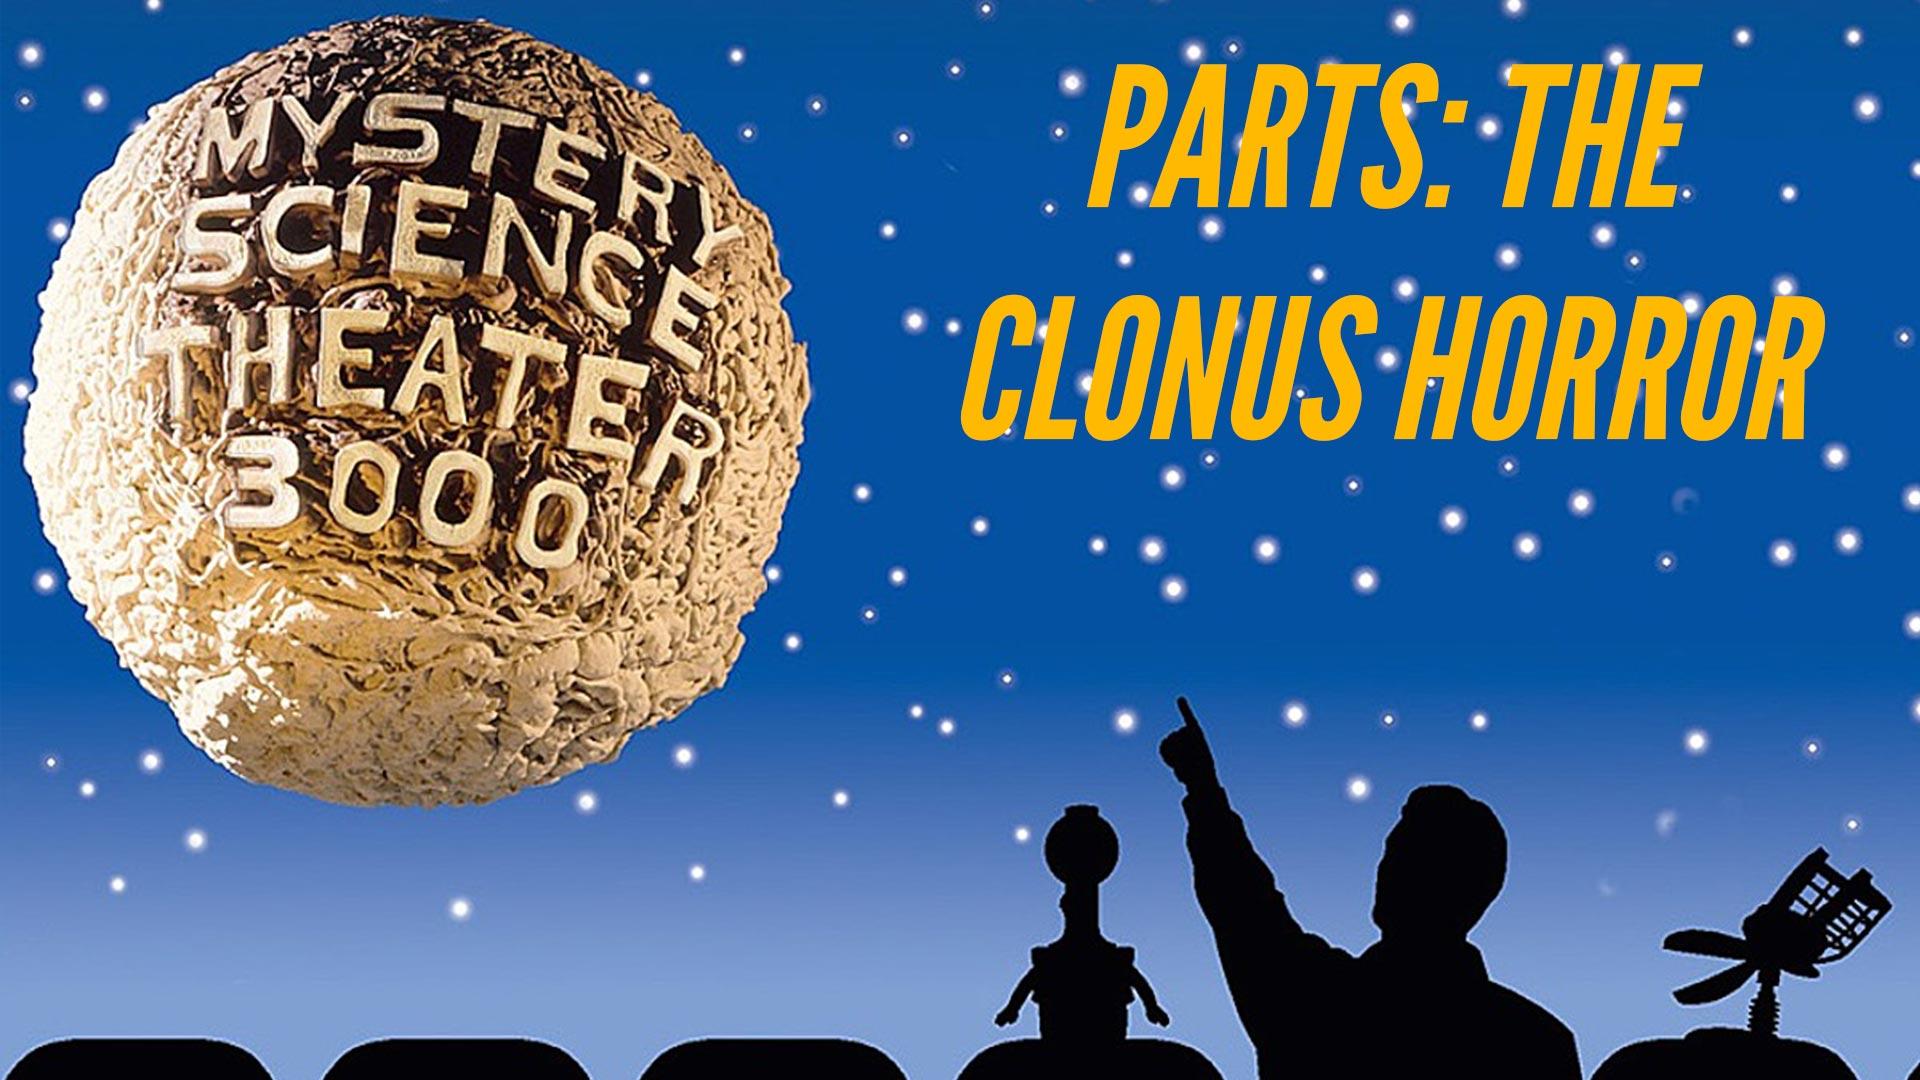 MST3K: Parts: The Clonus Horror